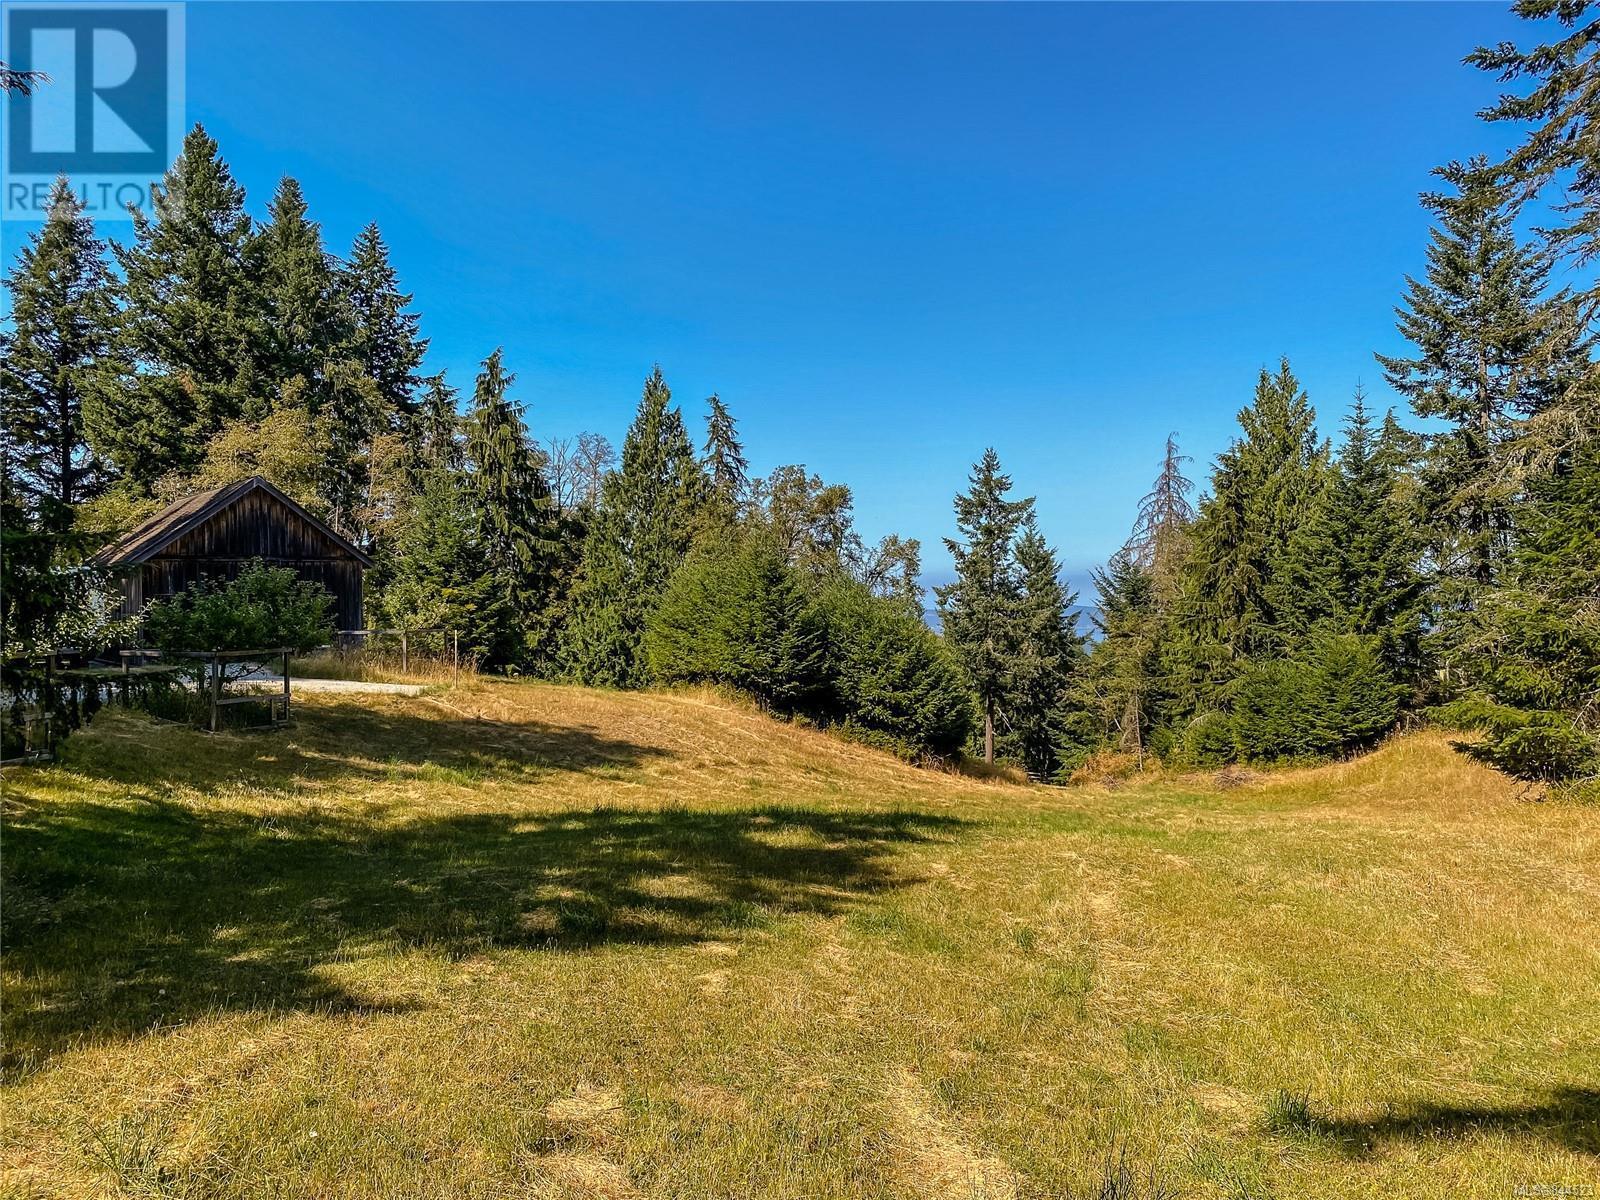 377 Seymour HtsSalt Spring, British Columbia  V8K 2B6 - Photo 42 - 844523